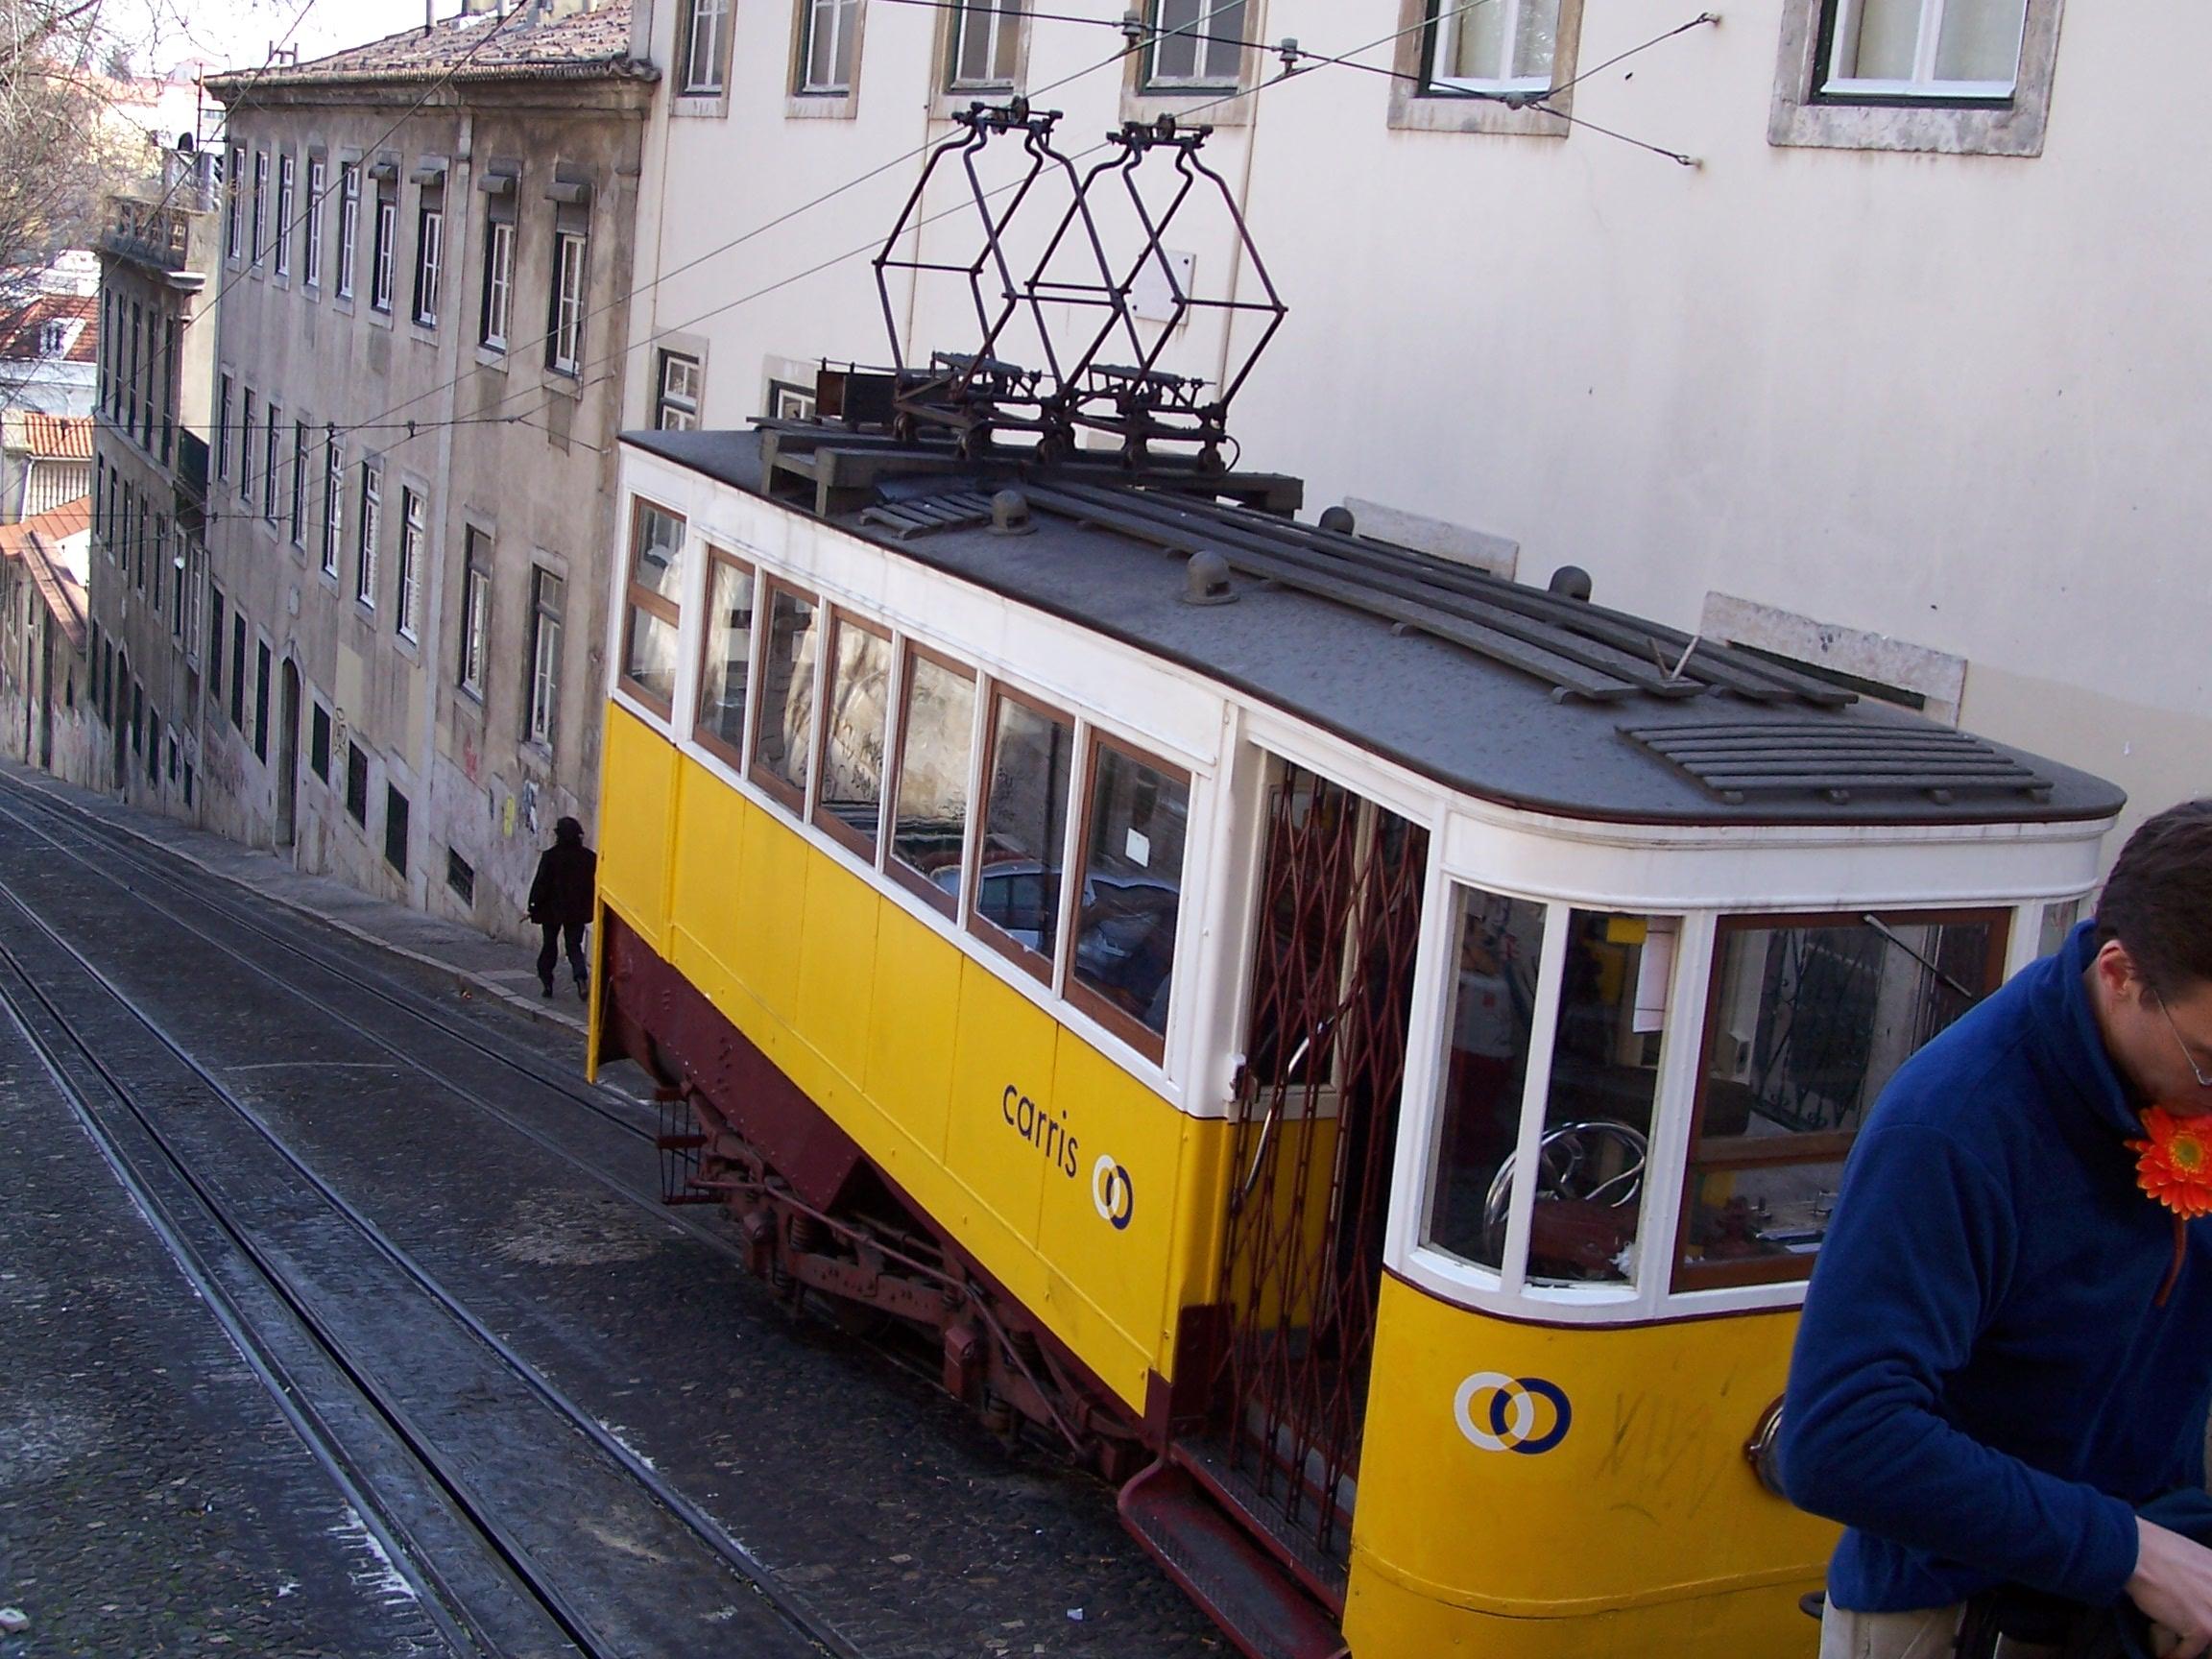 Lisbonne__10_13_Mars_05__008